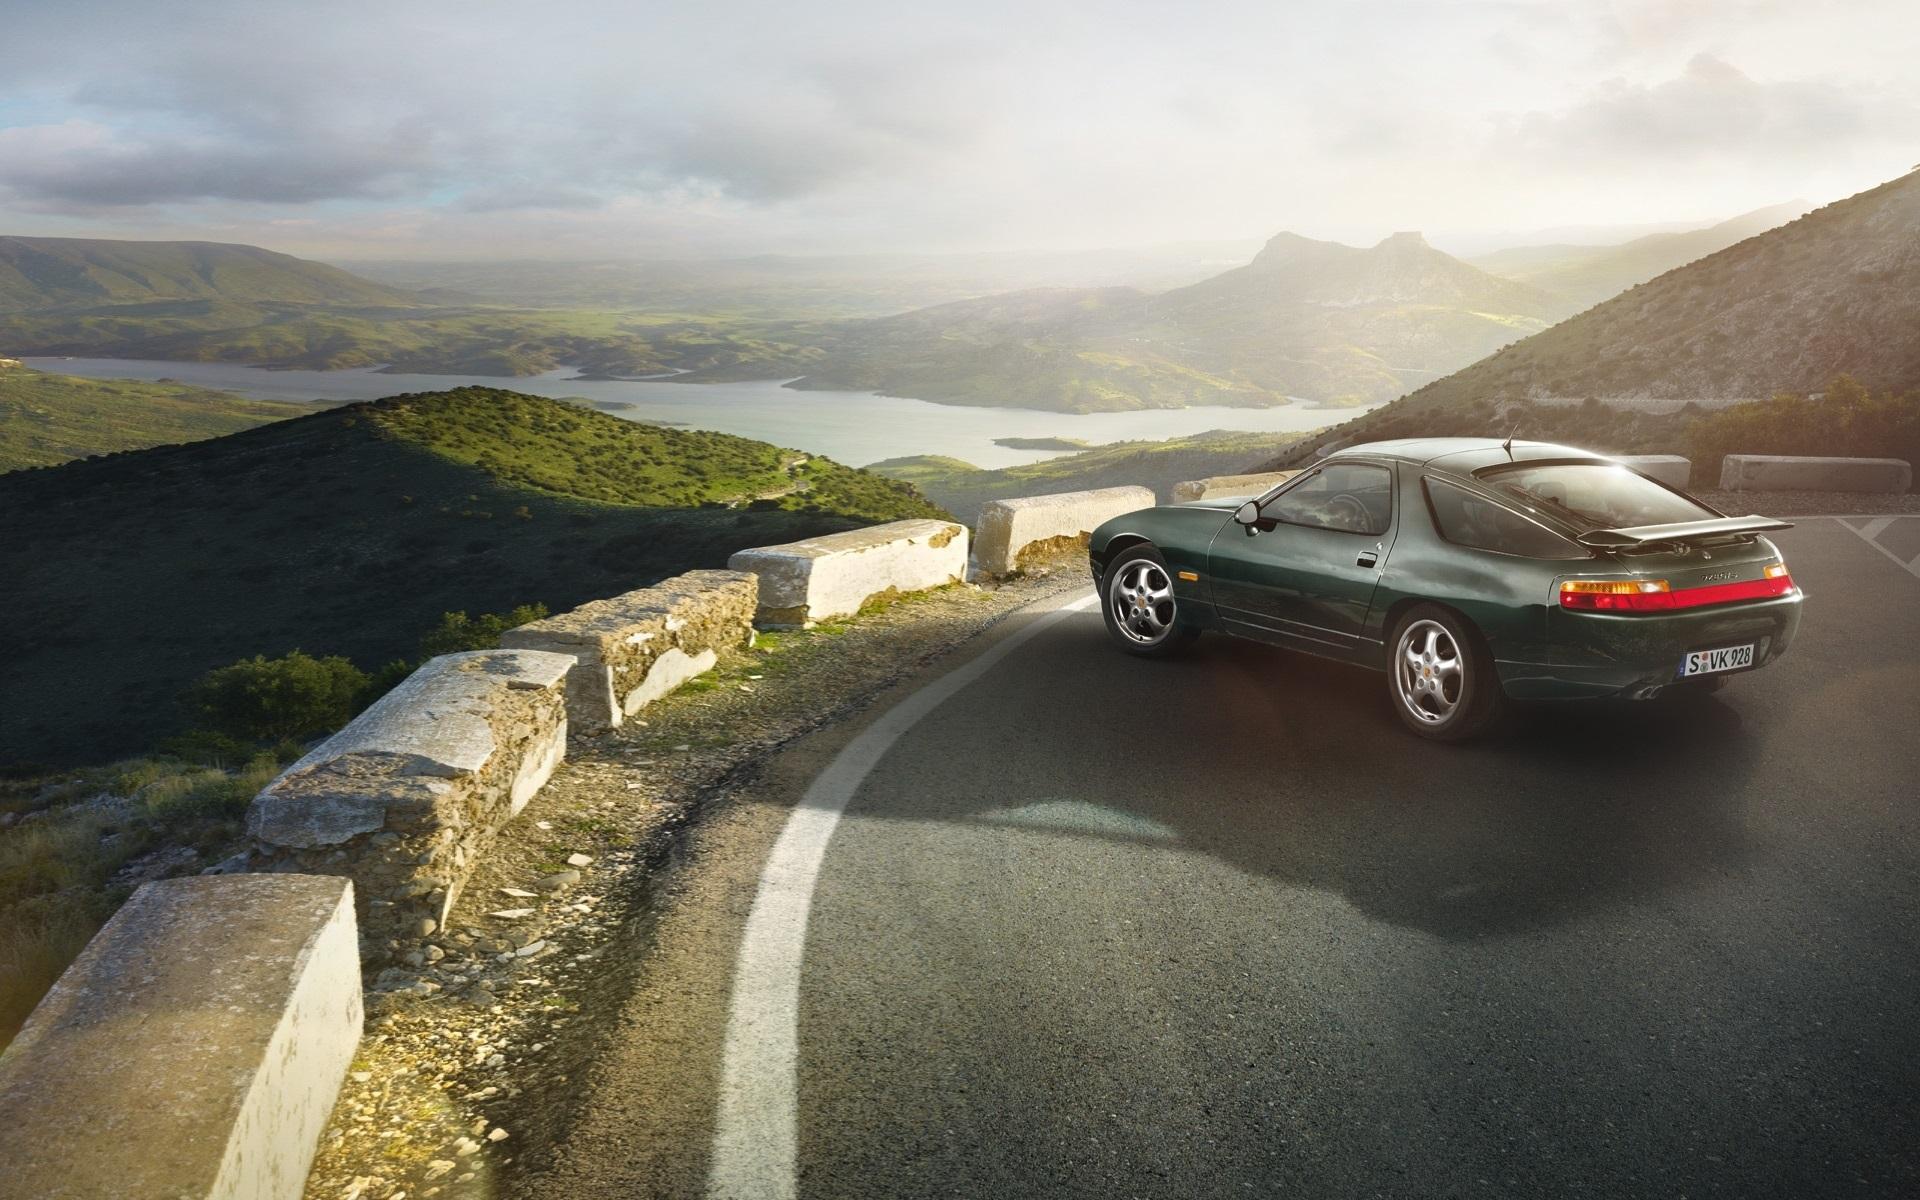 Wallpaper Porsche 928 Gts 1991 Green Car 1920x1200 Hd Picture Image